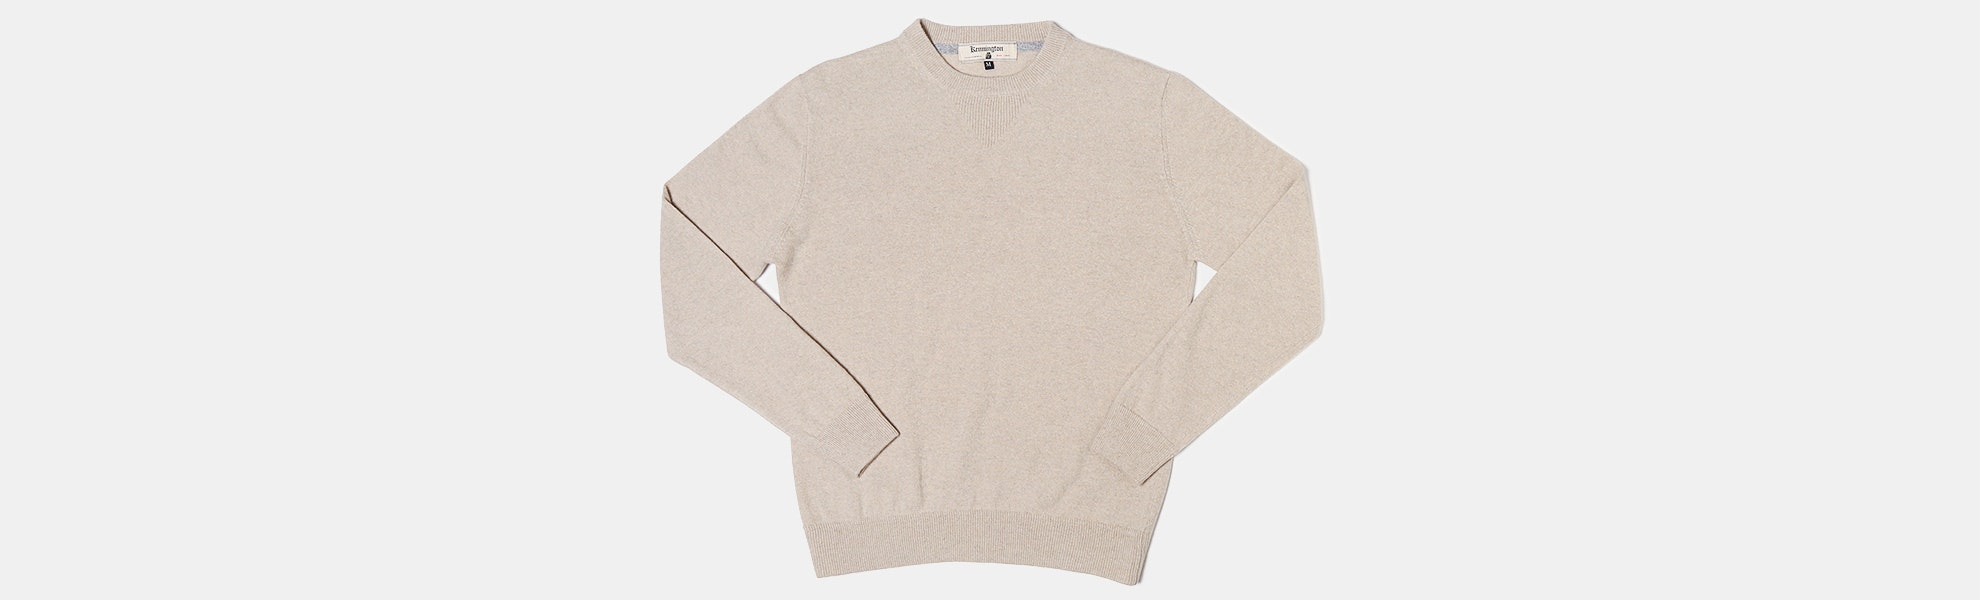 Kennington Italian Cashmere Sweaters